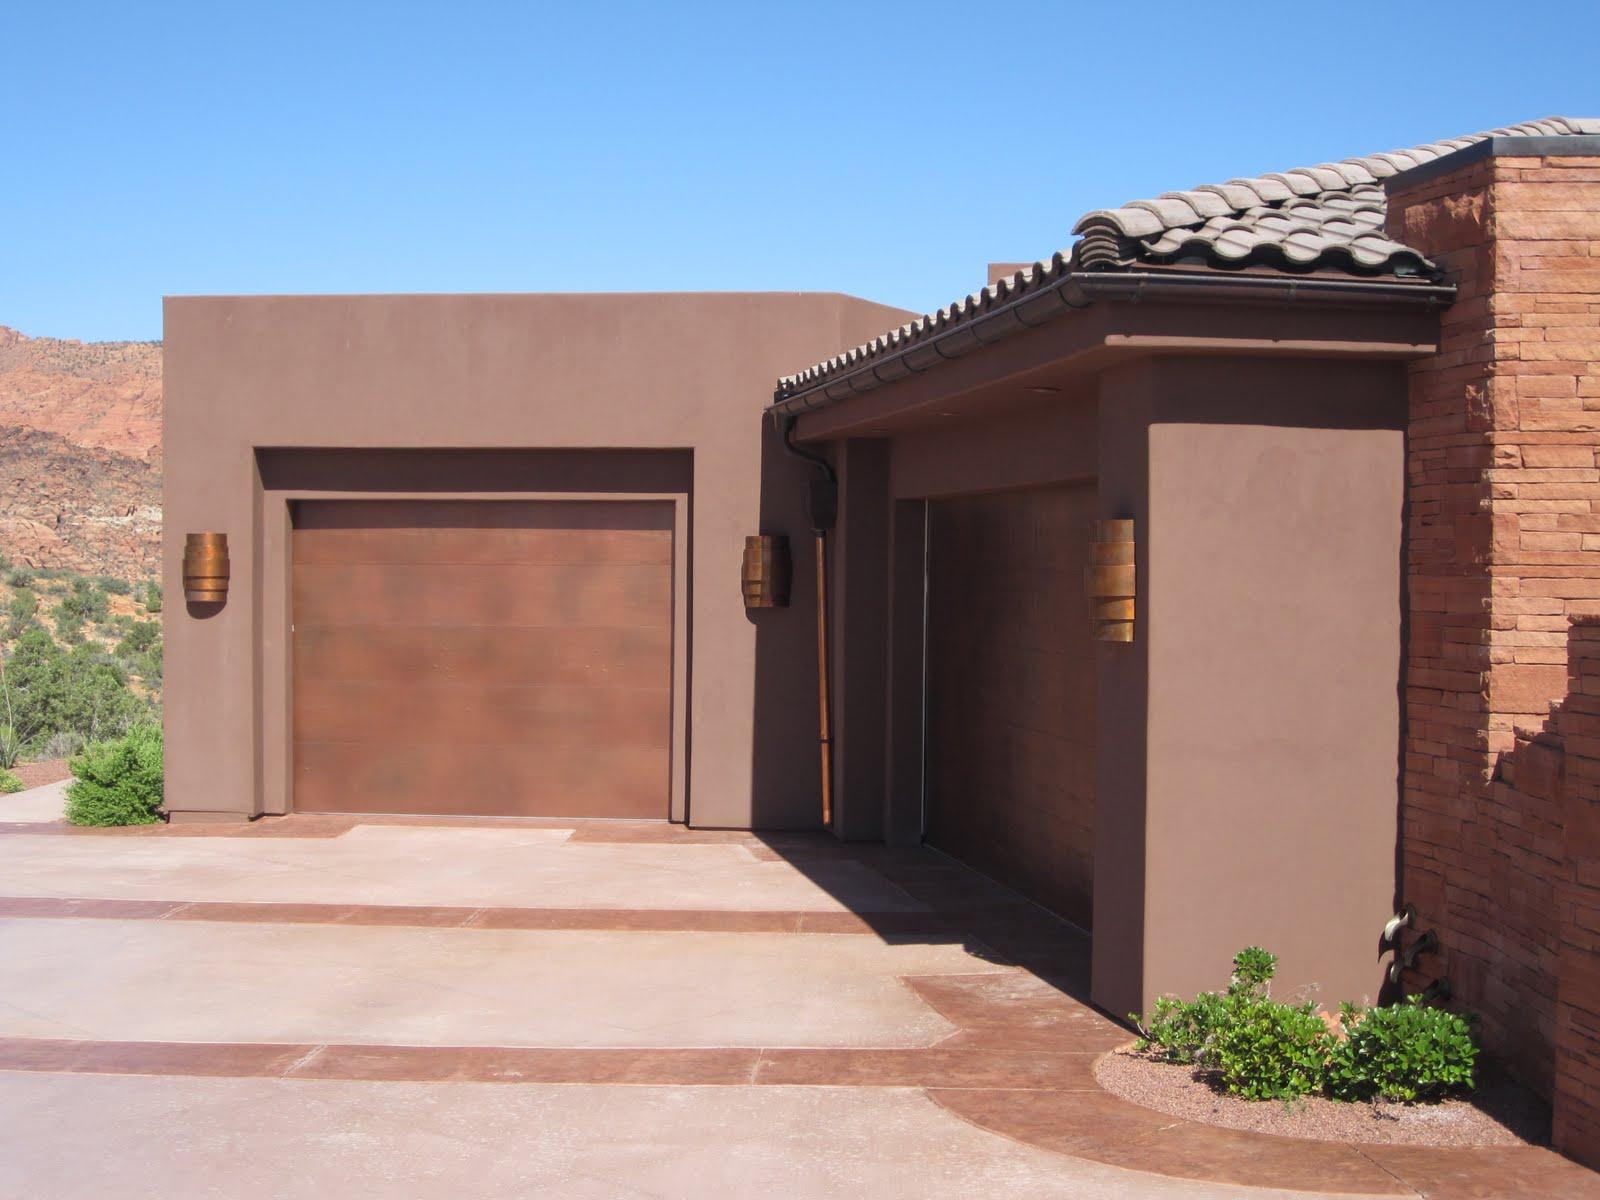 1200 #0865C3 BIG TIME House Lover : Garage Doors And Gates  St. George Utah wallpaper Utah Garage Doors 36851600